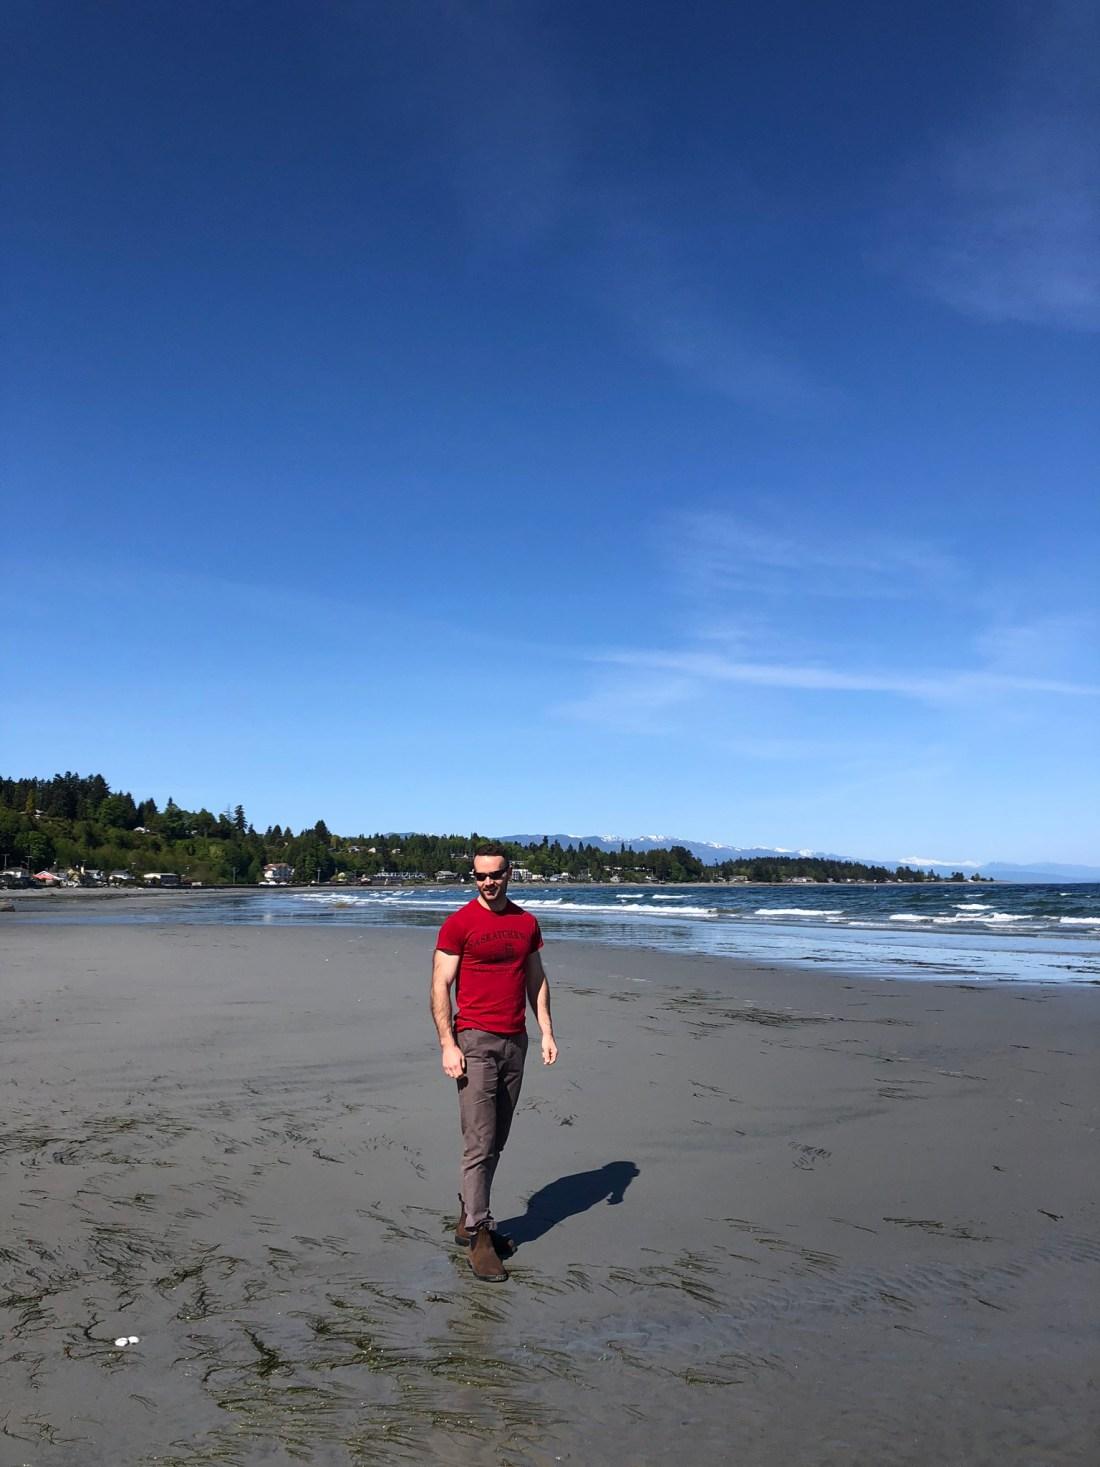 On Qualicum Beach, Vancouver